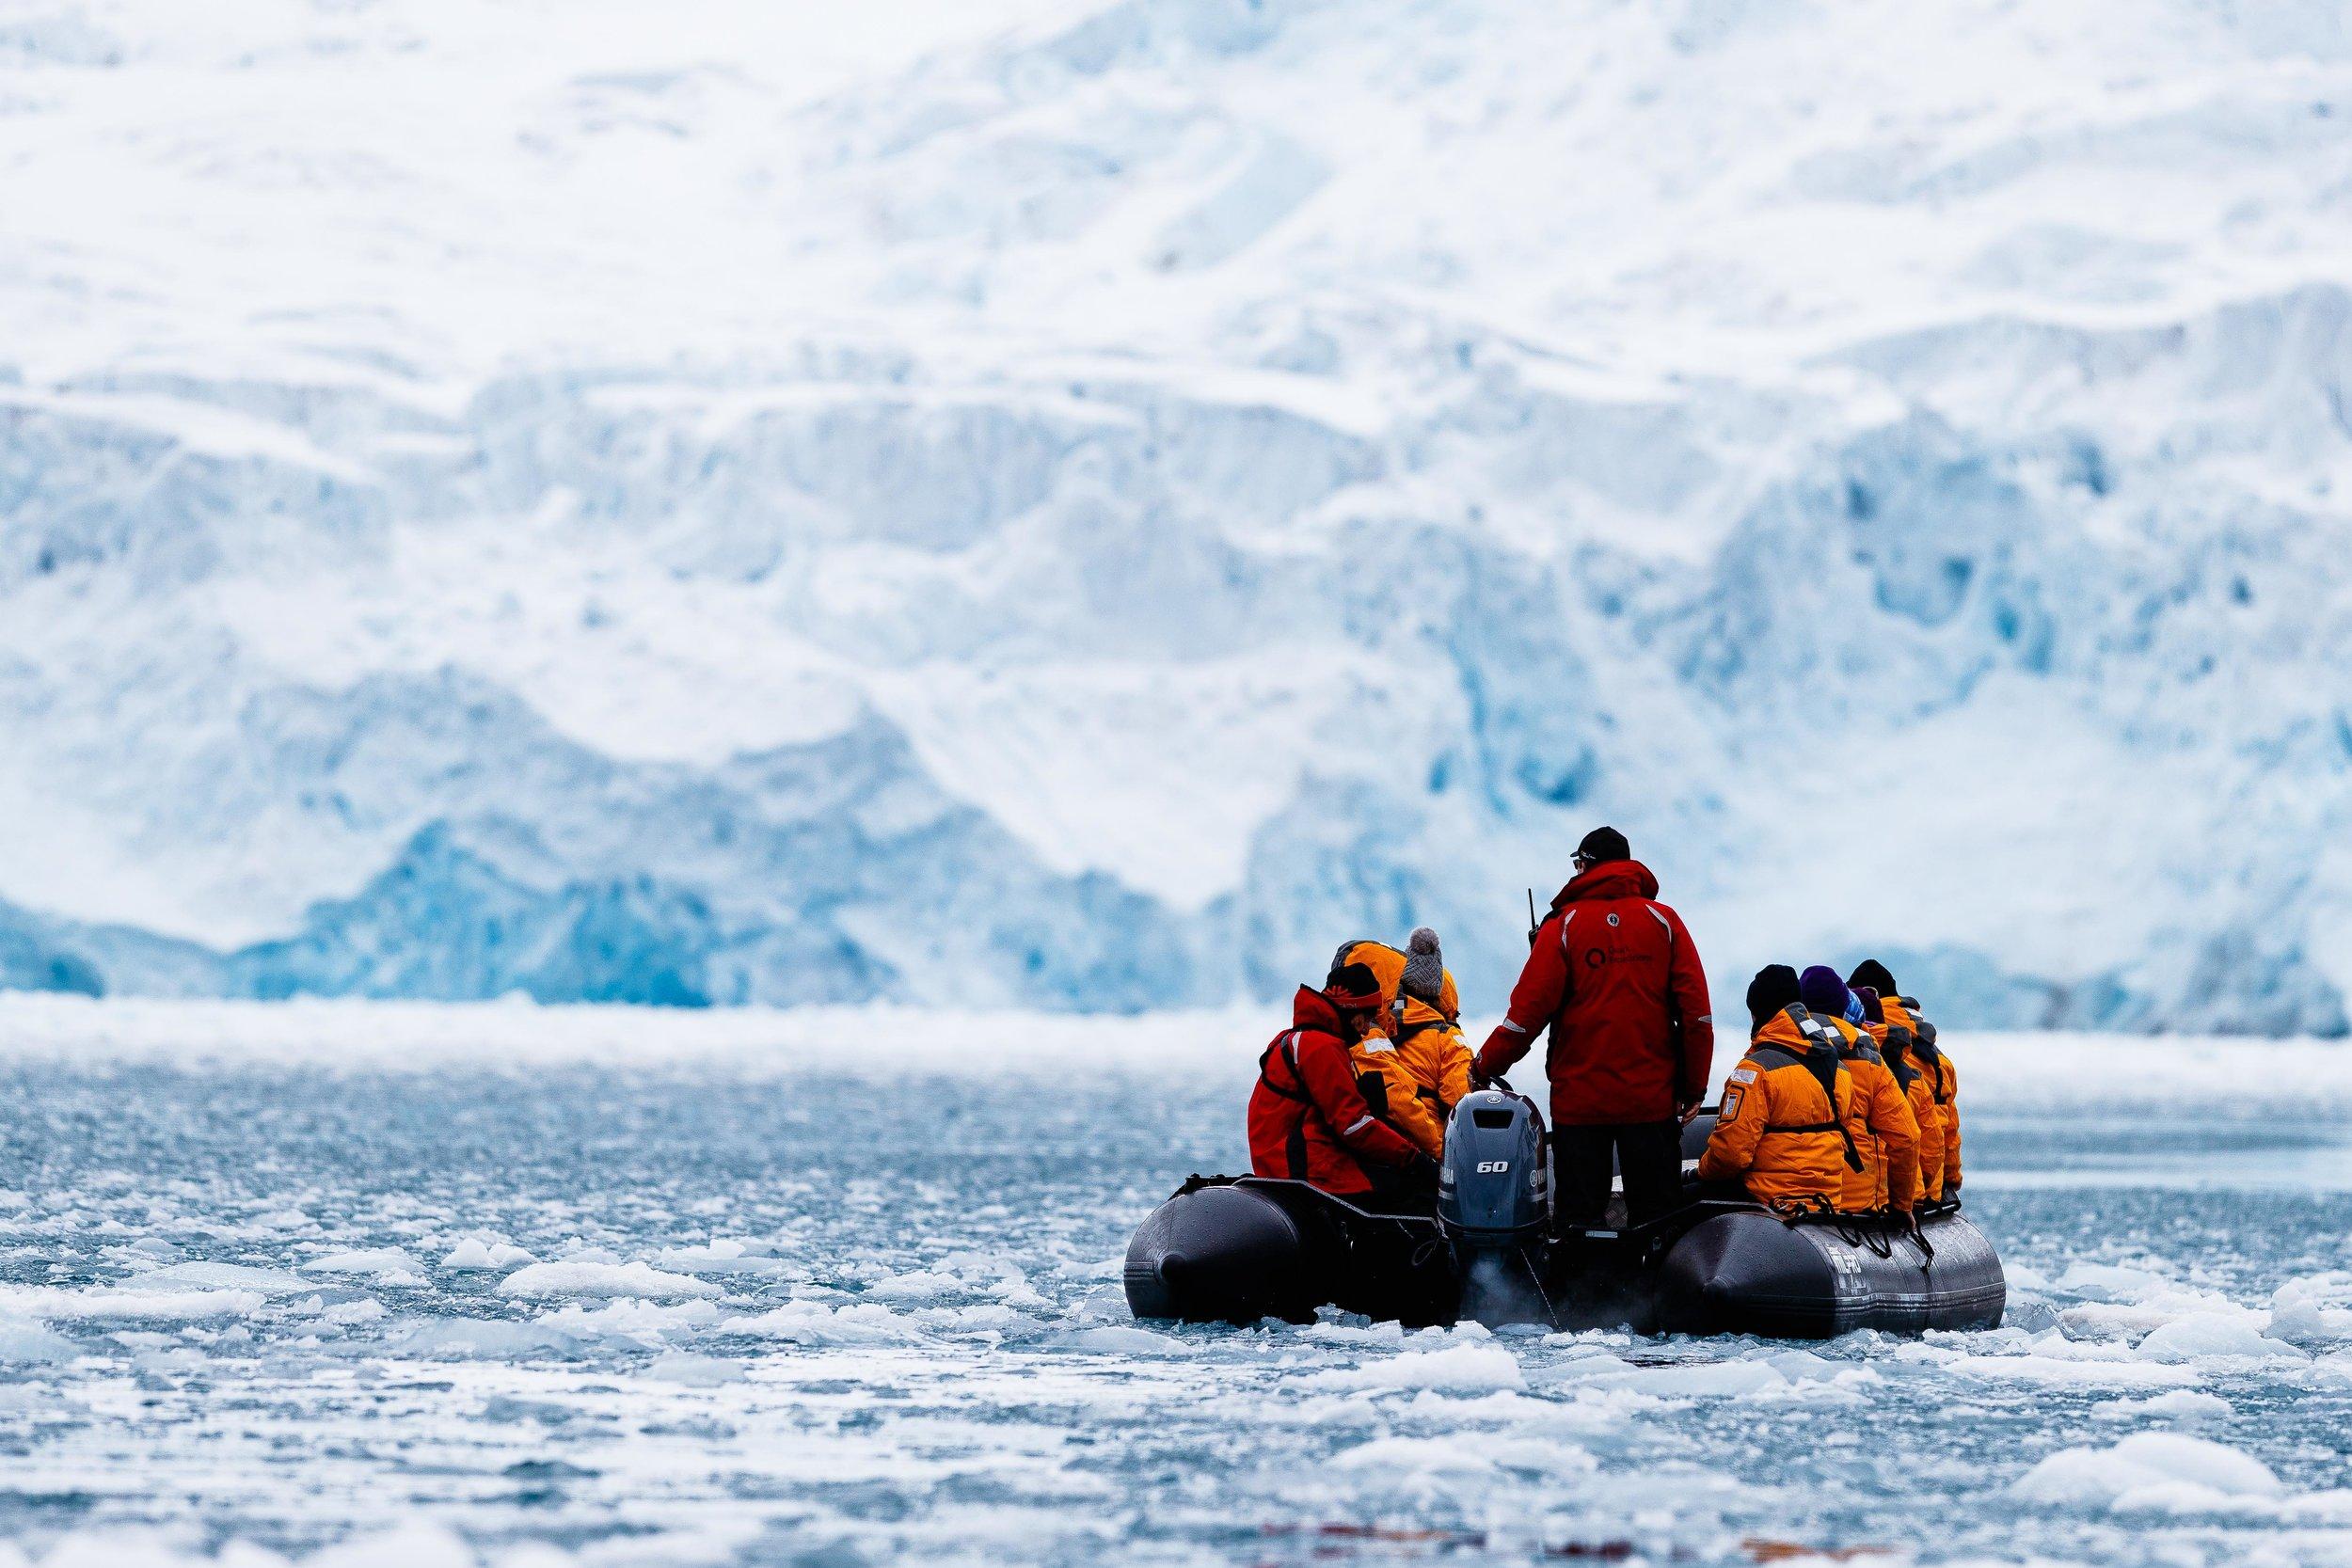 PRC photo Quark Expeditions_Intro to Spitsbergen_NICKYSOUNESS- Arctic; Ocean Atlantic; Svalbald; Fuglefjord; zodiac-7728.jpg